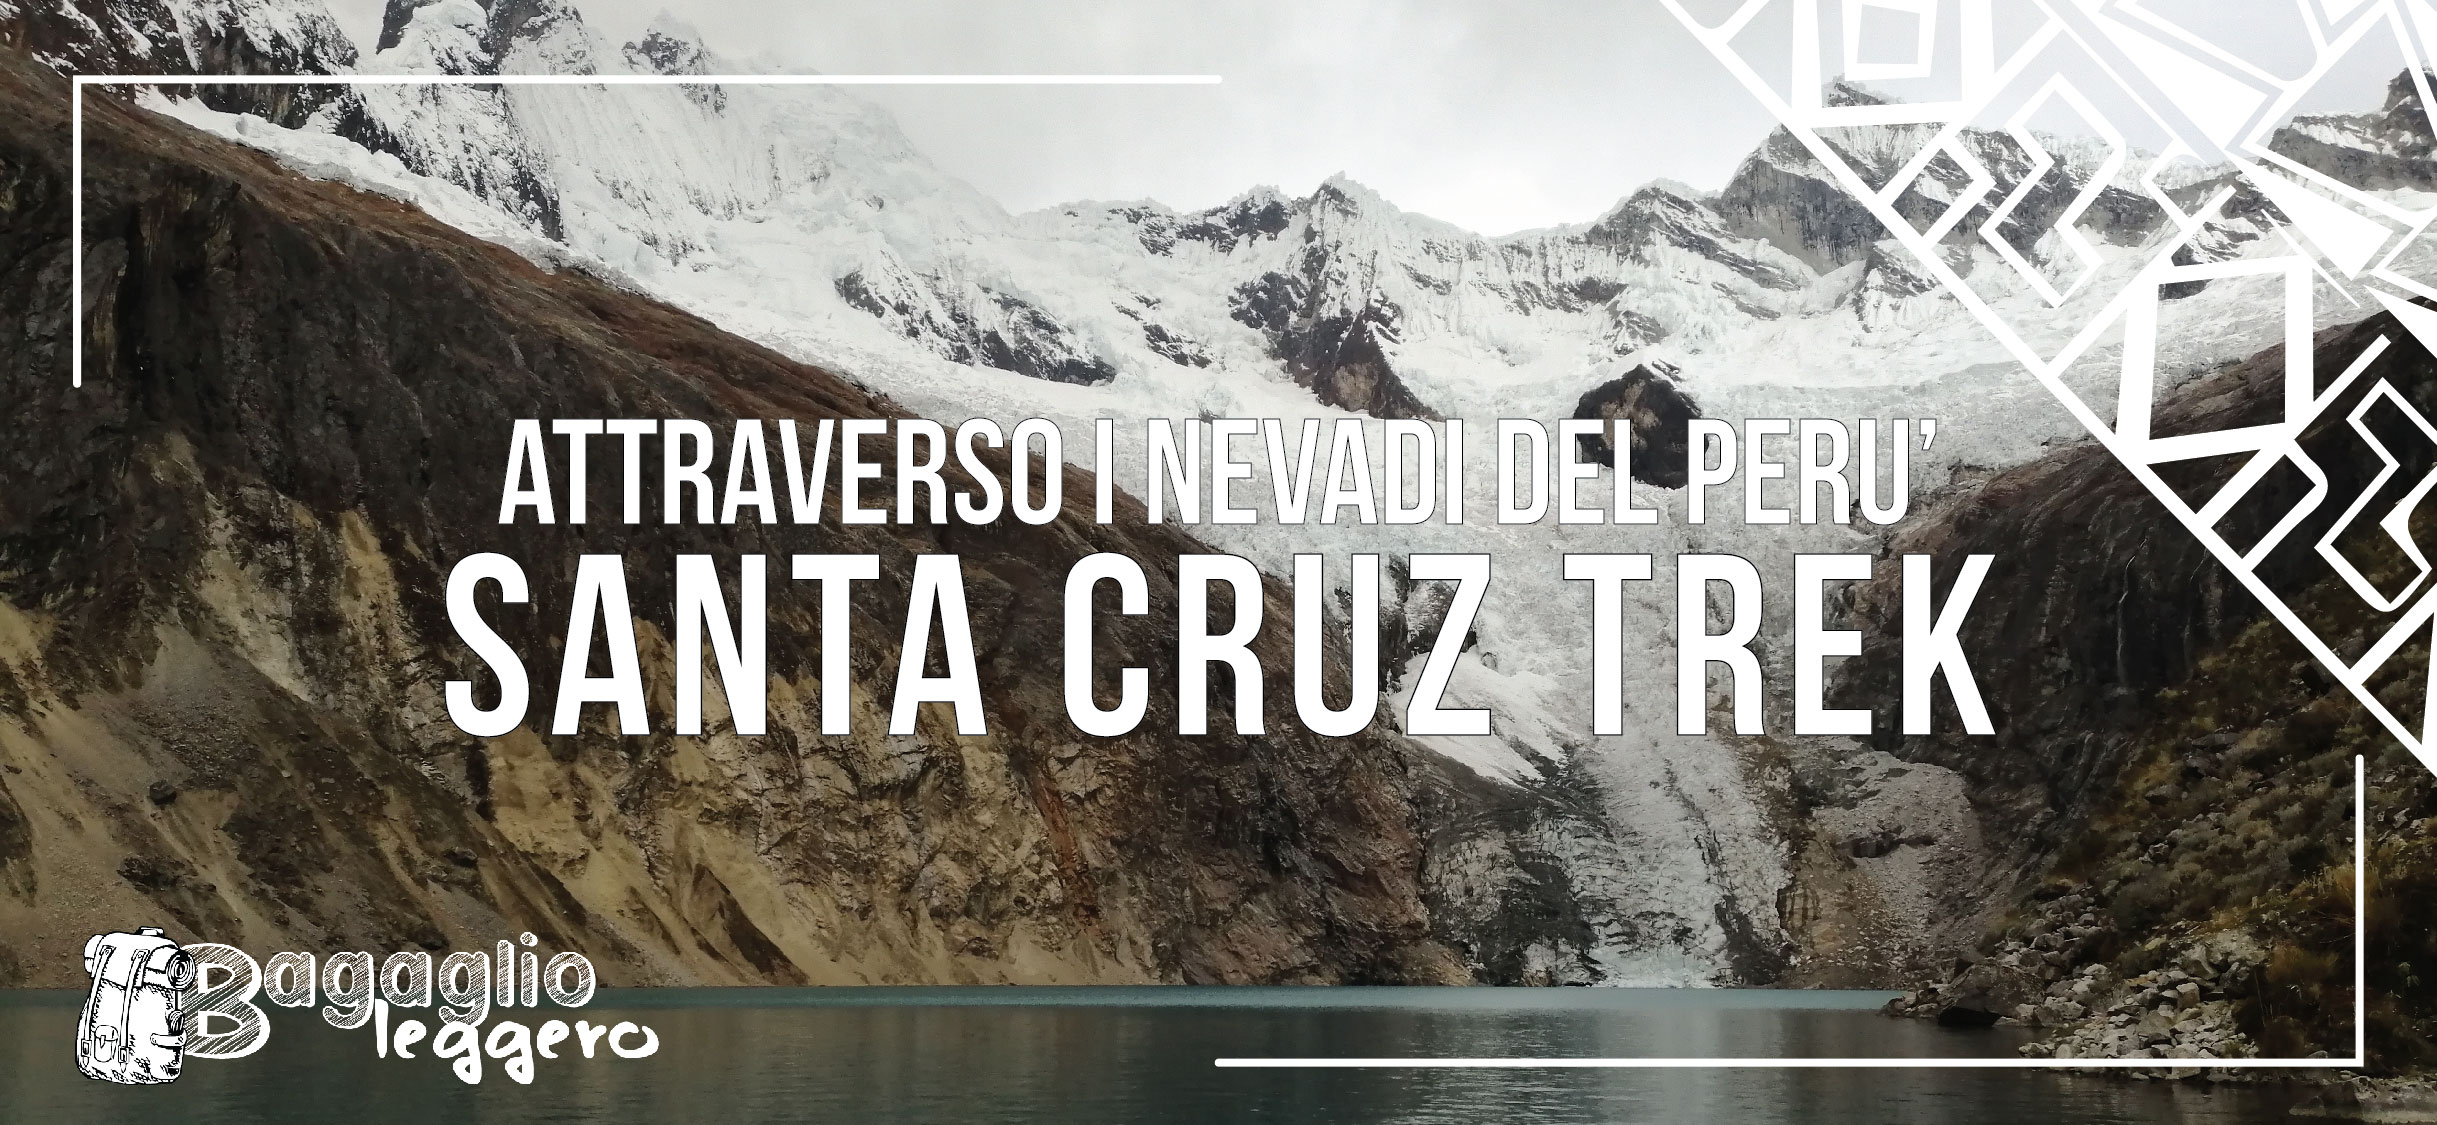 Santa Cruz Trek